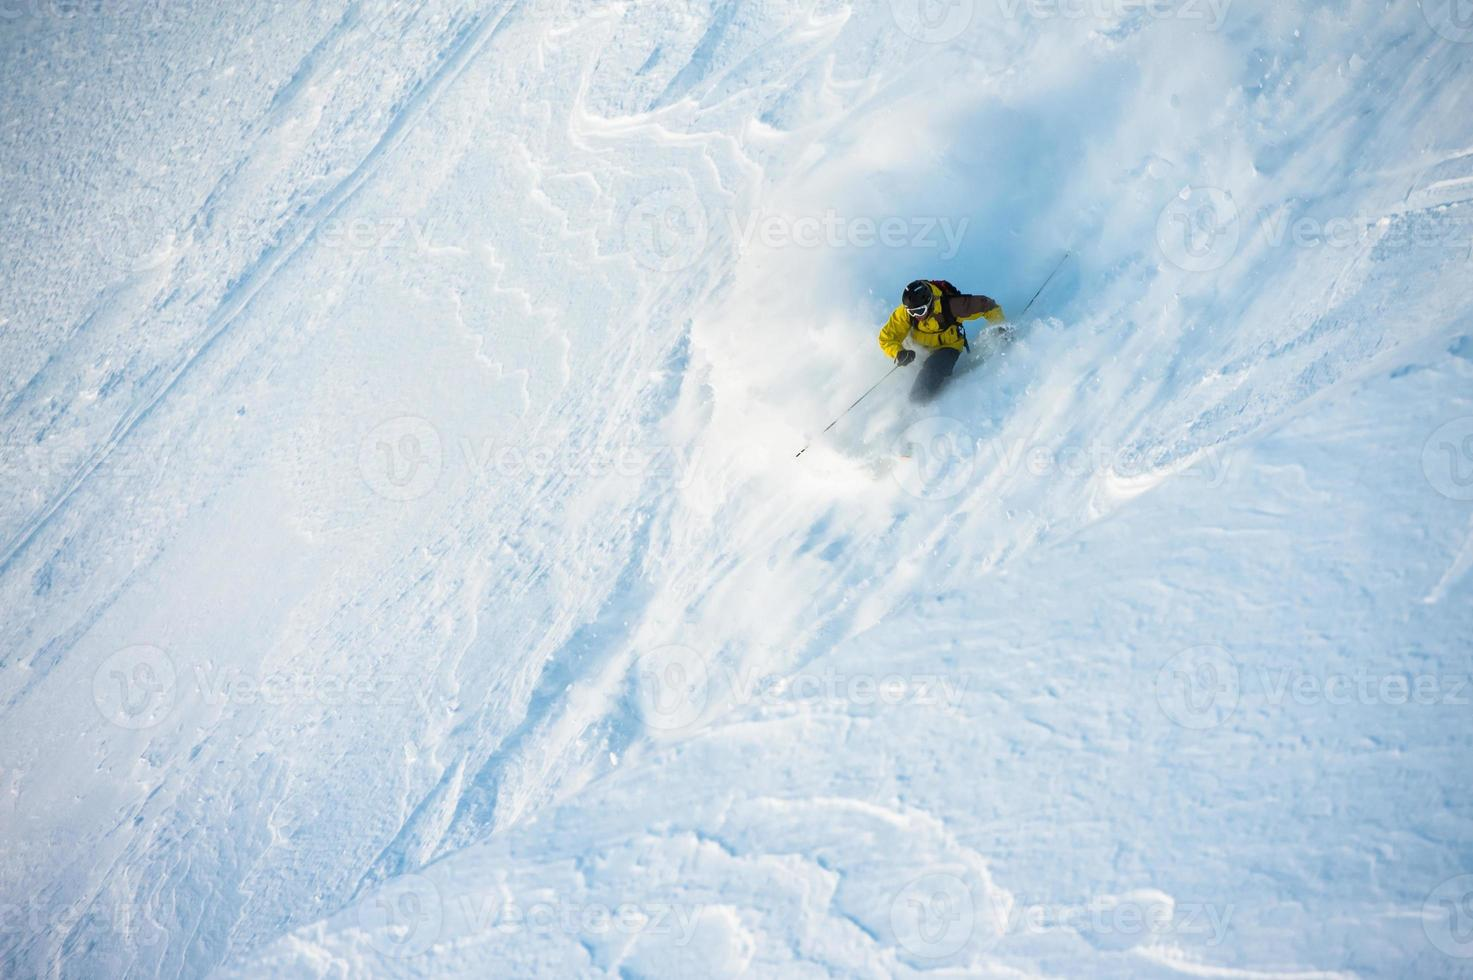 esquiar en nieve en polvo foto